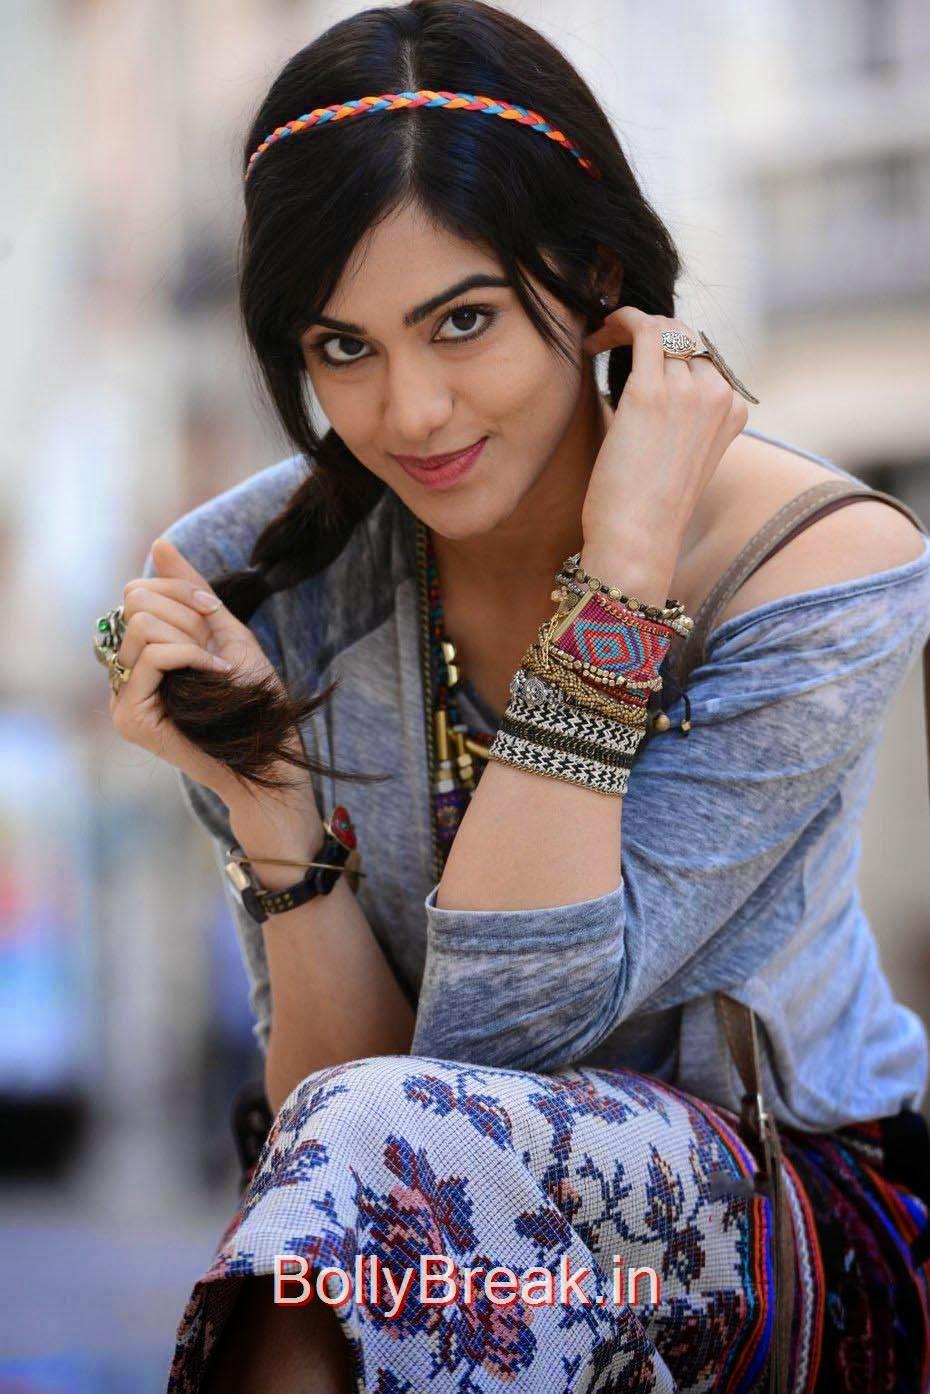 Adah Sharma Images, Adah Sharma Hot Pics In Grey and White Top